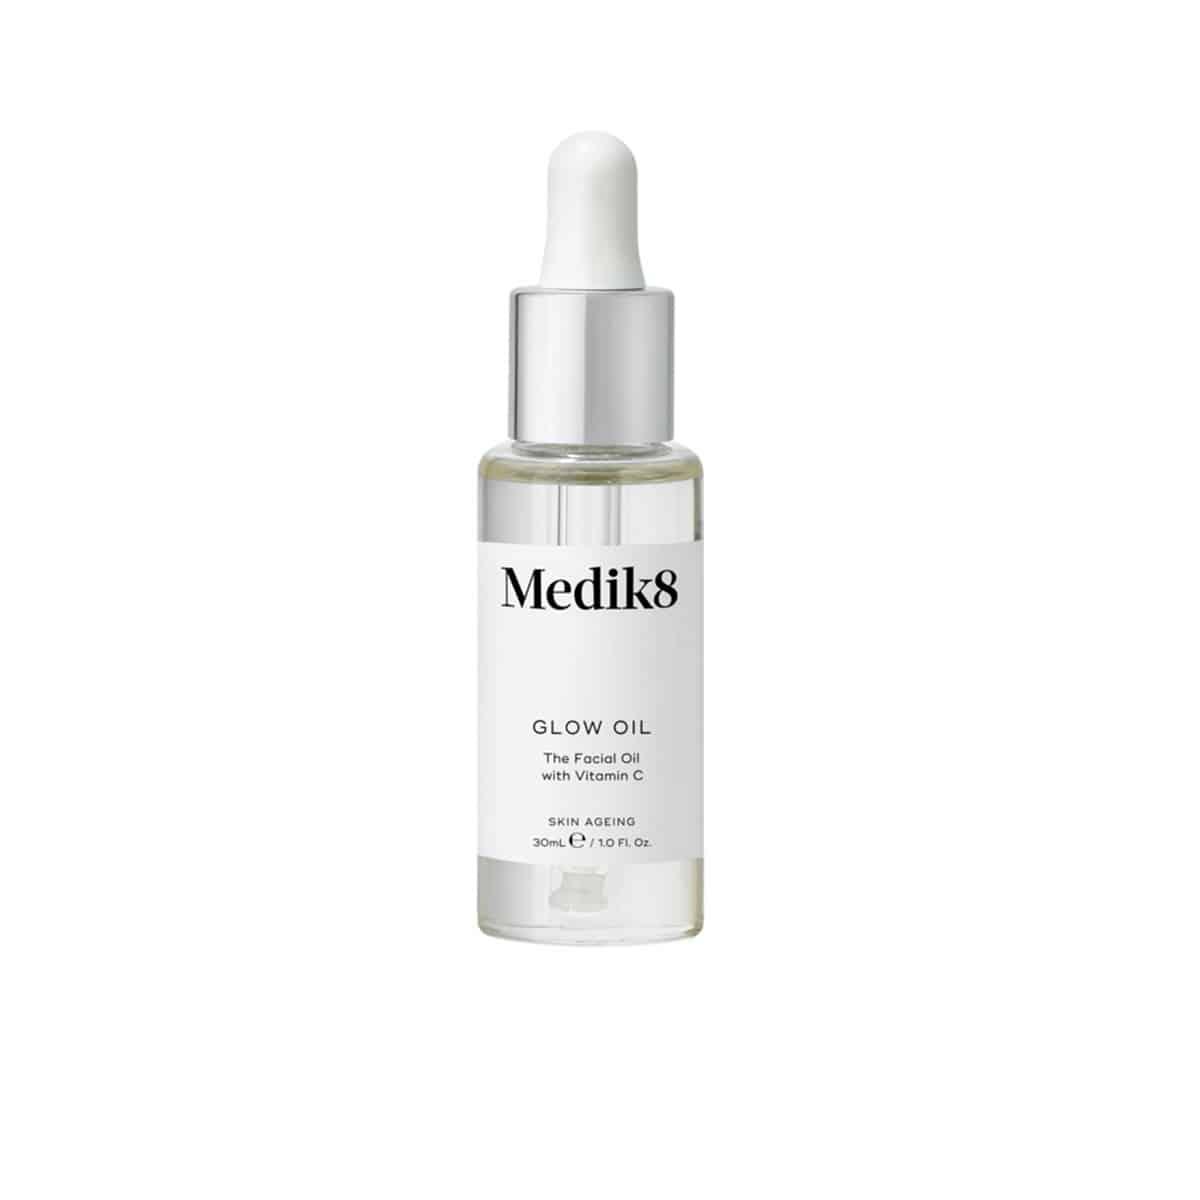 Medik8 Glow Oil Ireland